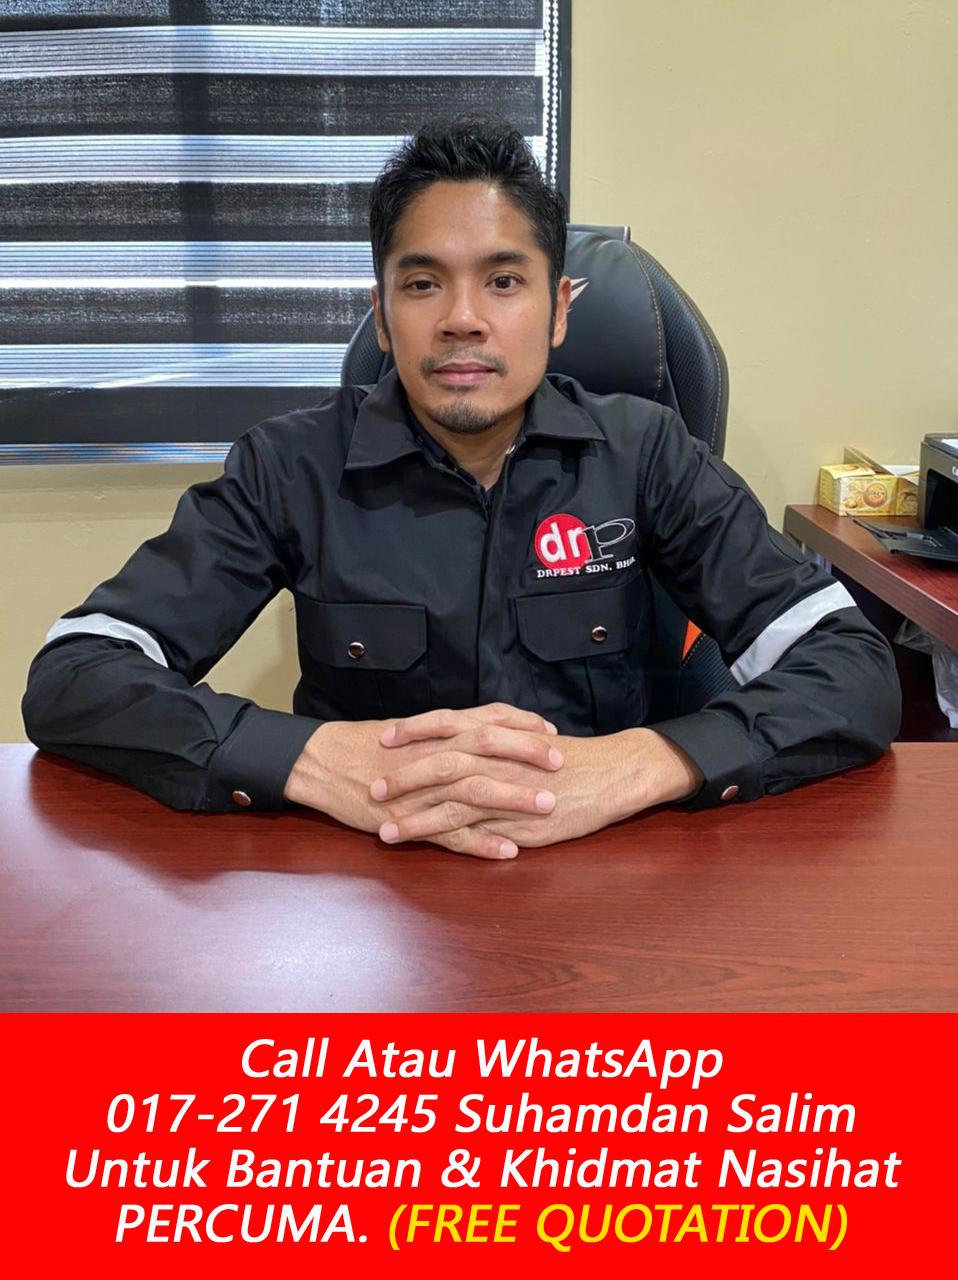 drpest sdn bhd drp maintenance and services syarikat kawalan serangga bumiputra yang berlesen the best company pest control near me area Bukit Damansara kl near me